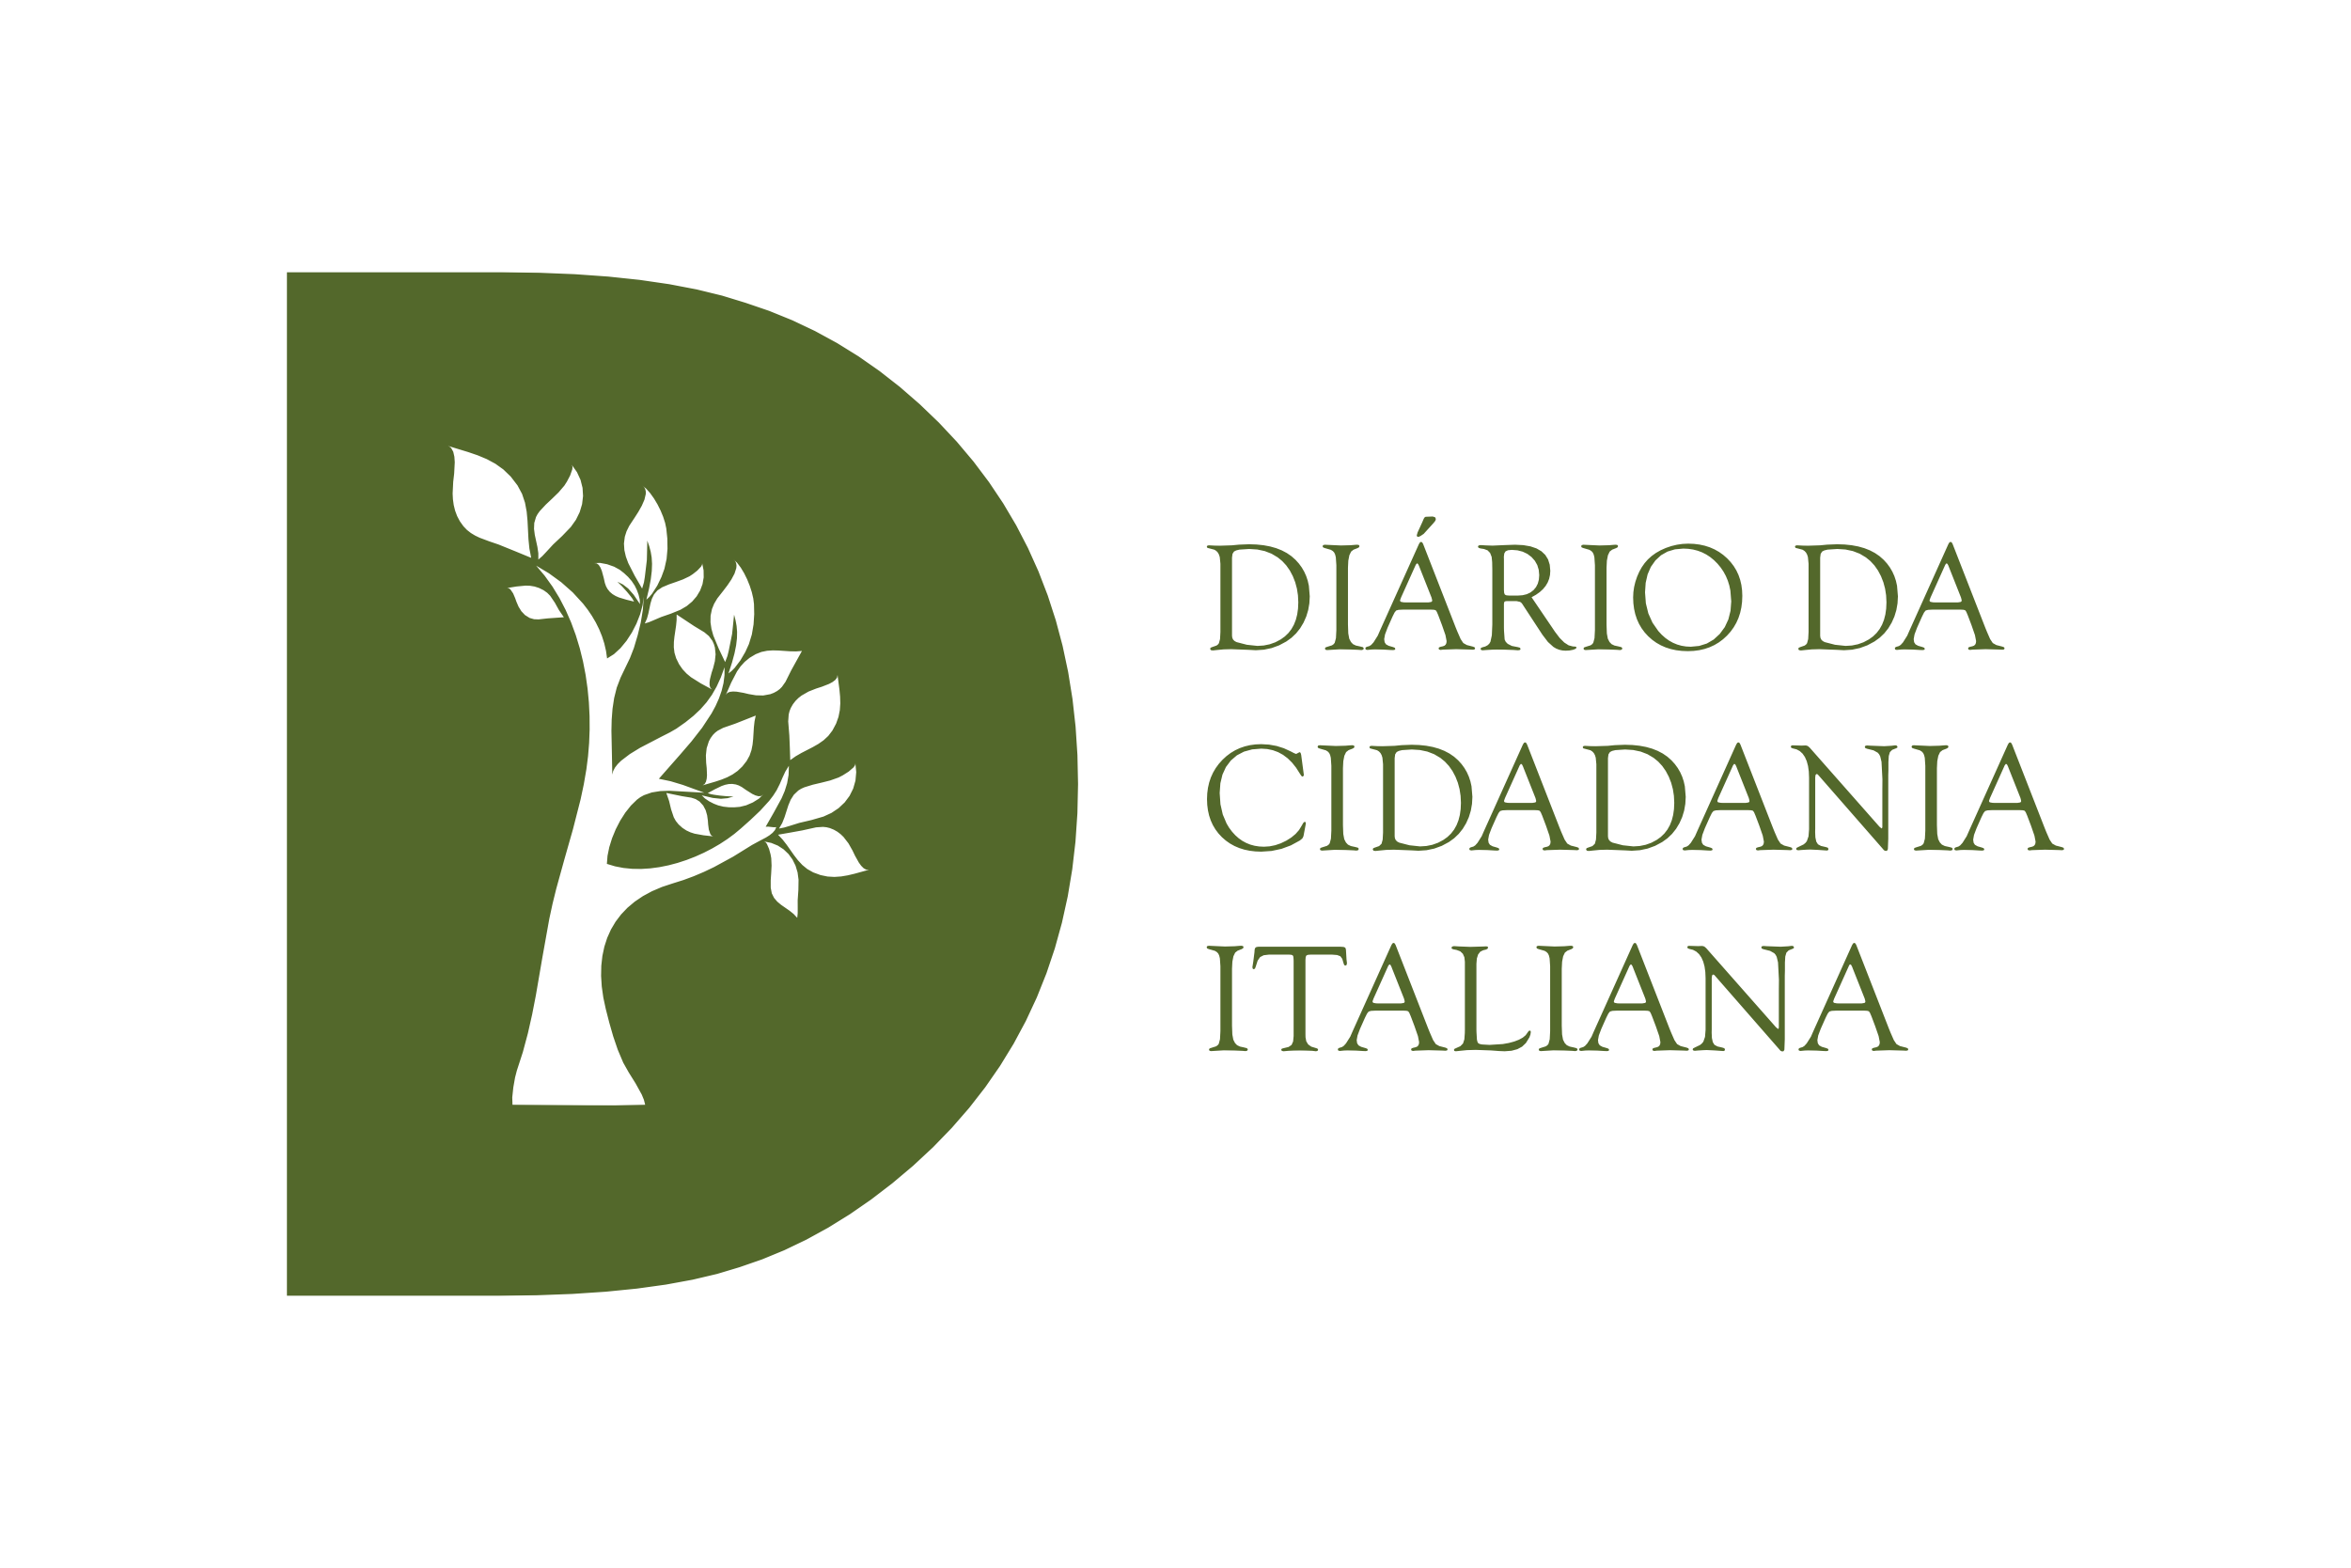 Website de Barbara Ferreira: diariodacidadaniaitaliana.com